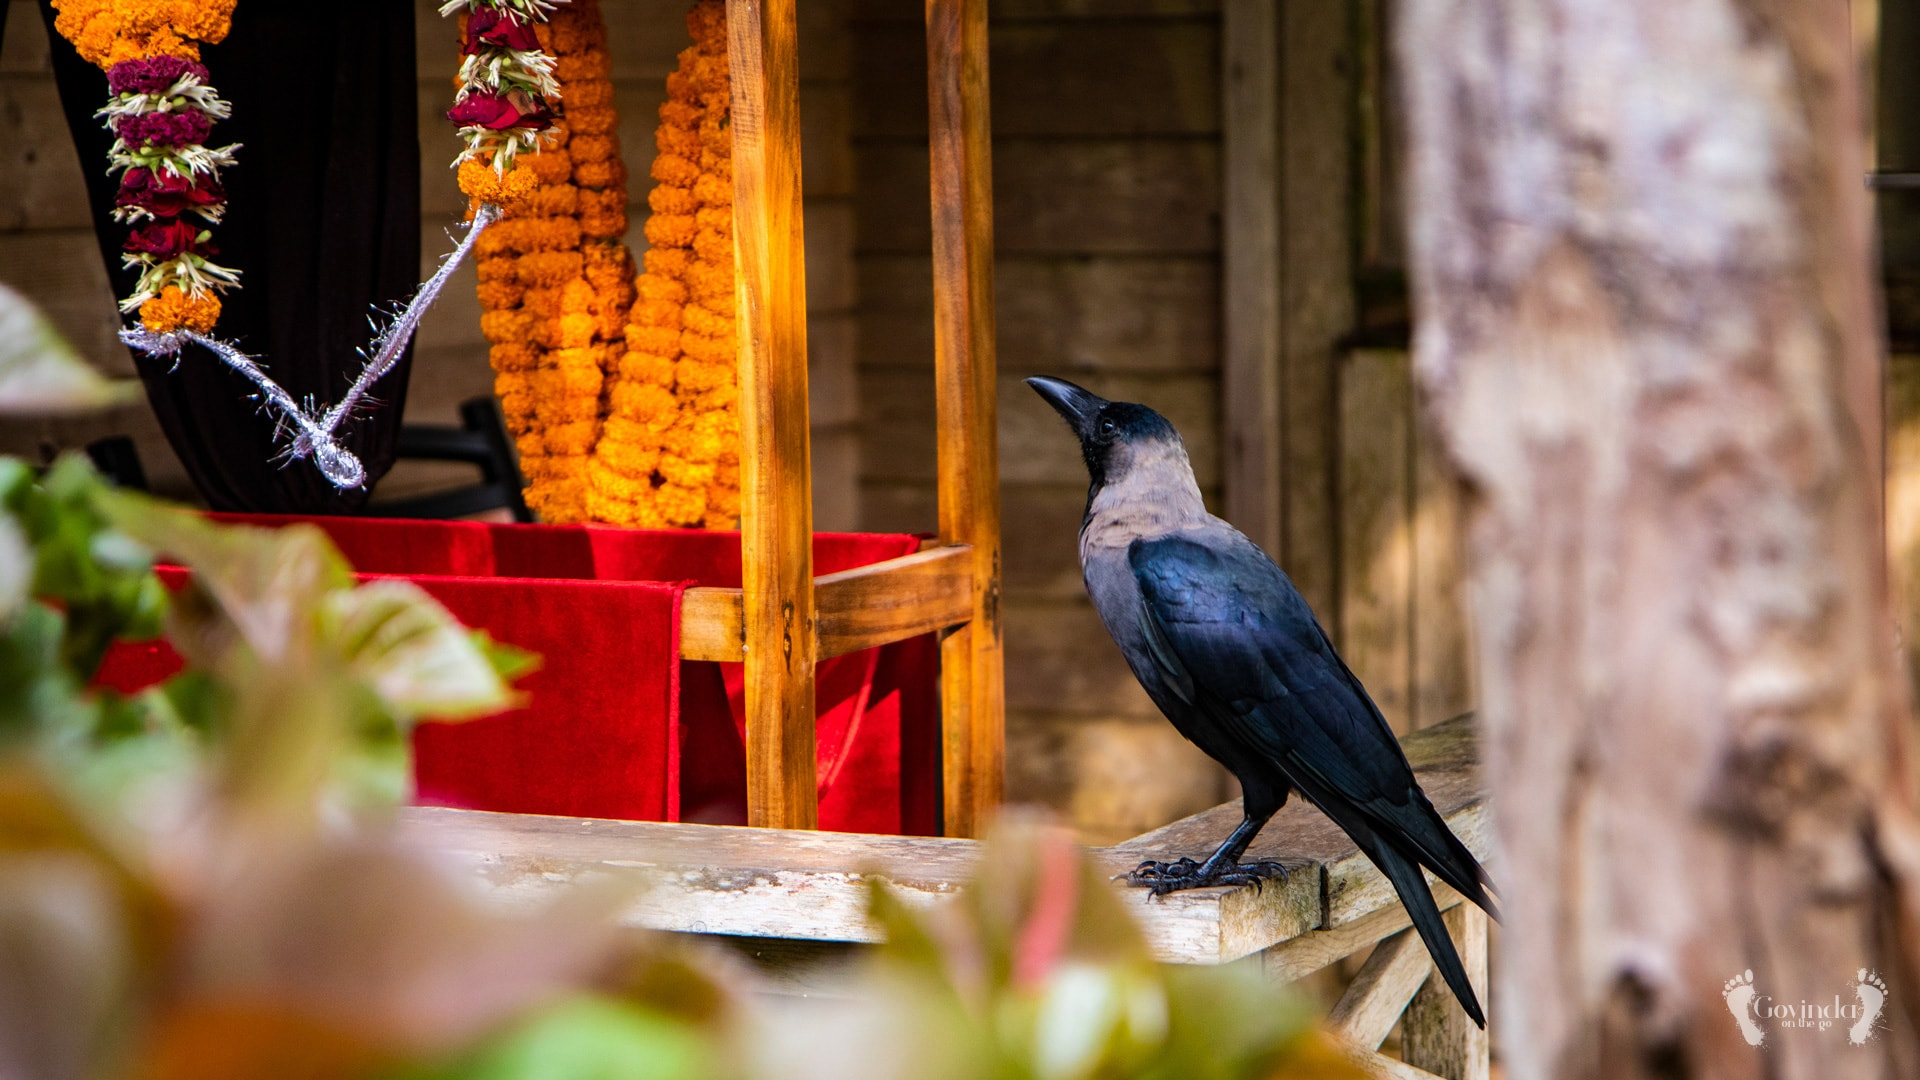 Crow looking at Guruji's flower garland